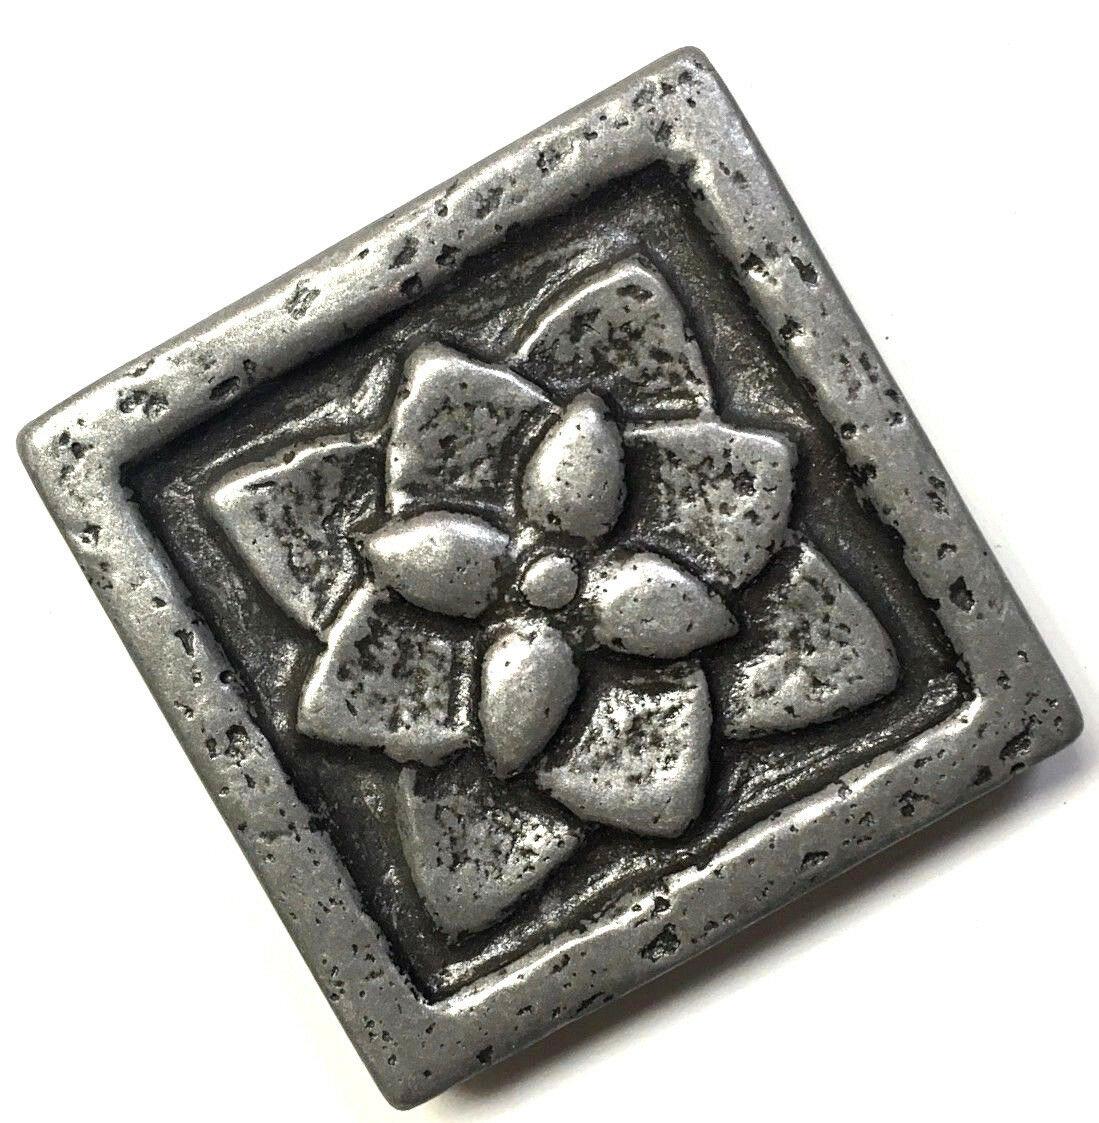 flora 2x2 metal resin decorative insert accent piece art craft tile